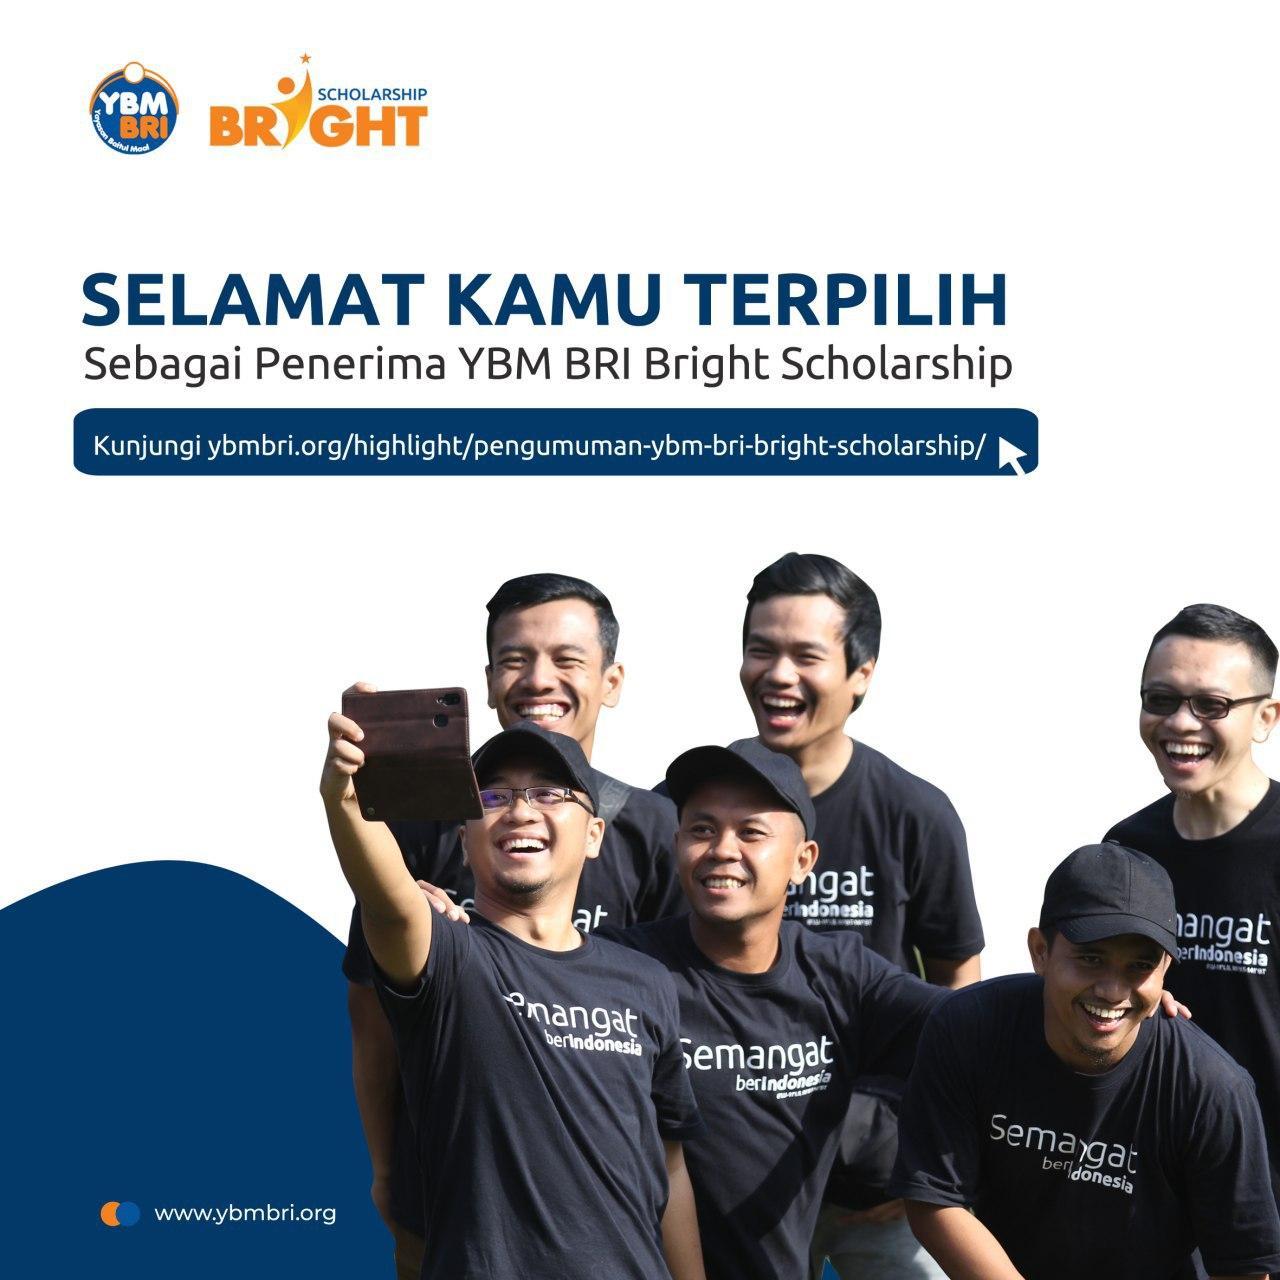 Pengumuman Hasil Akhir YBM BRI Bright Scholarship